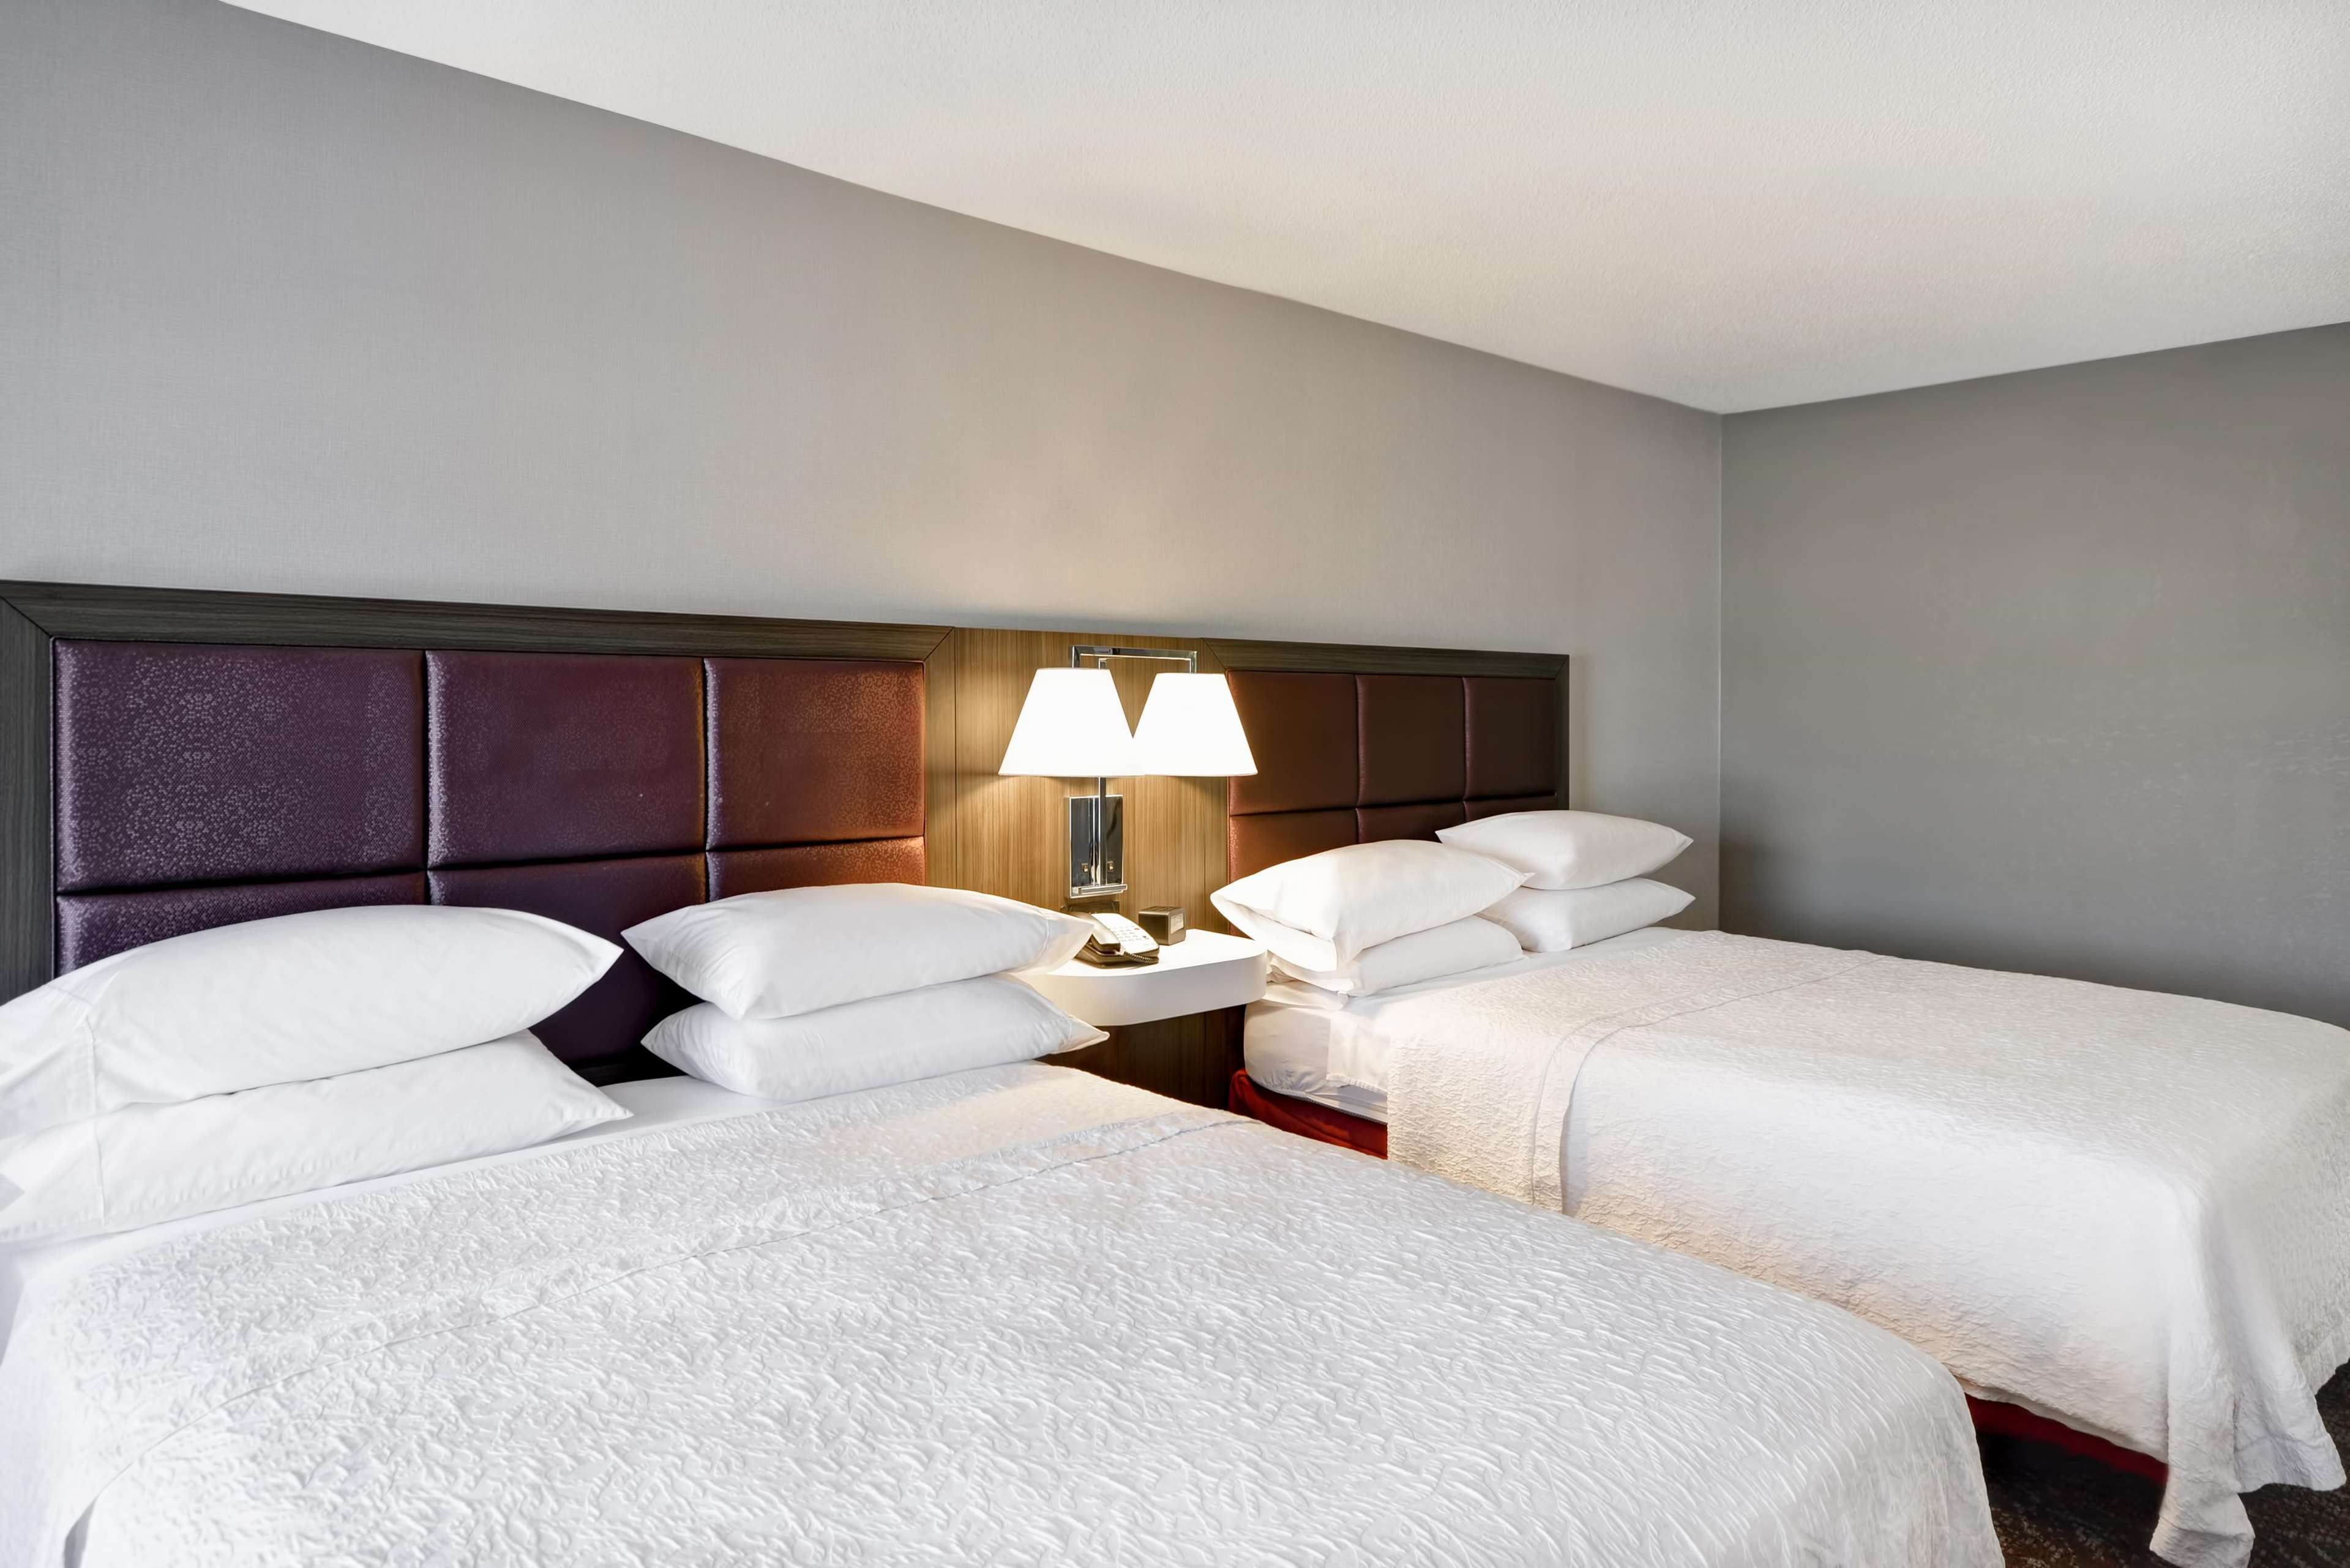 Hampton Inn & Suites Columbus-Easton Area image 38